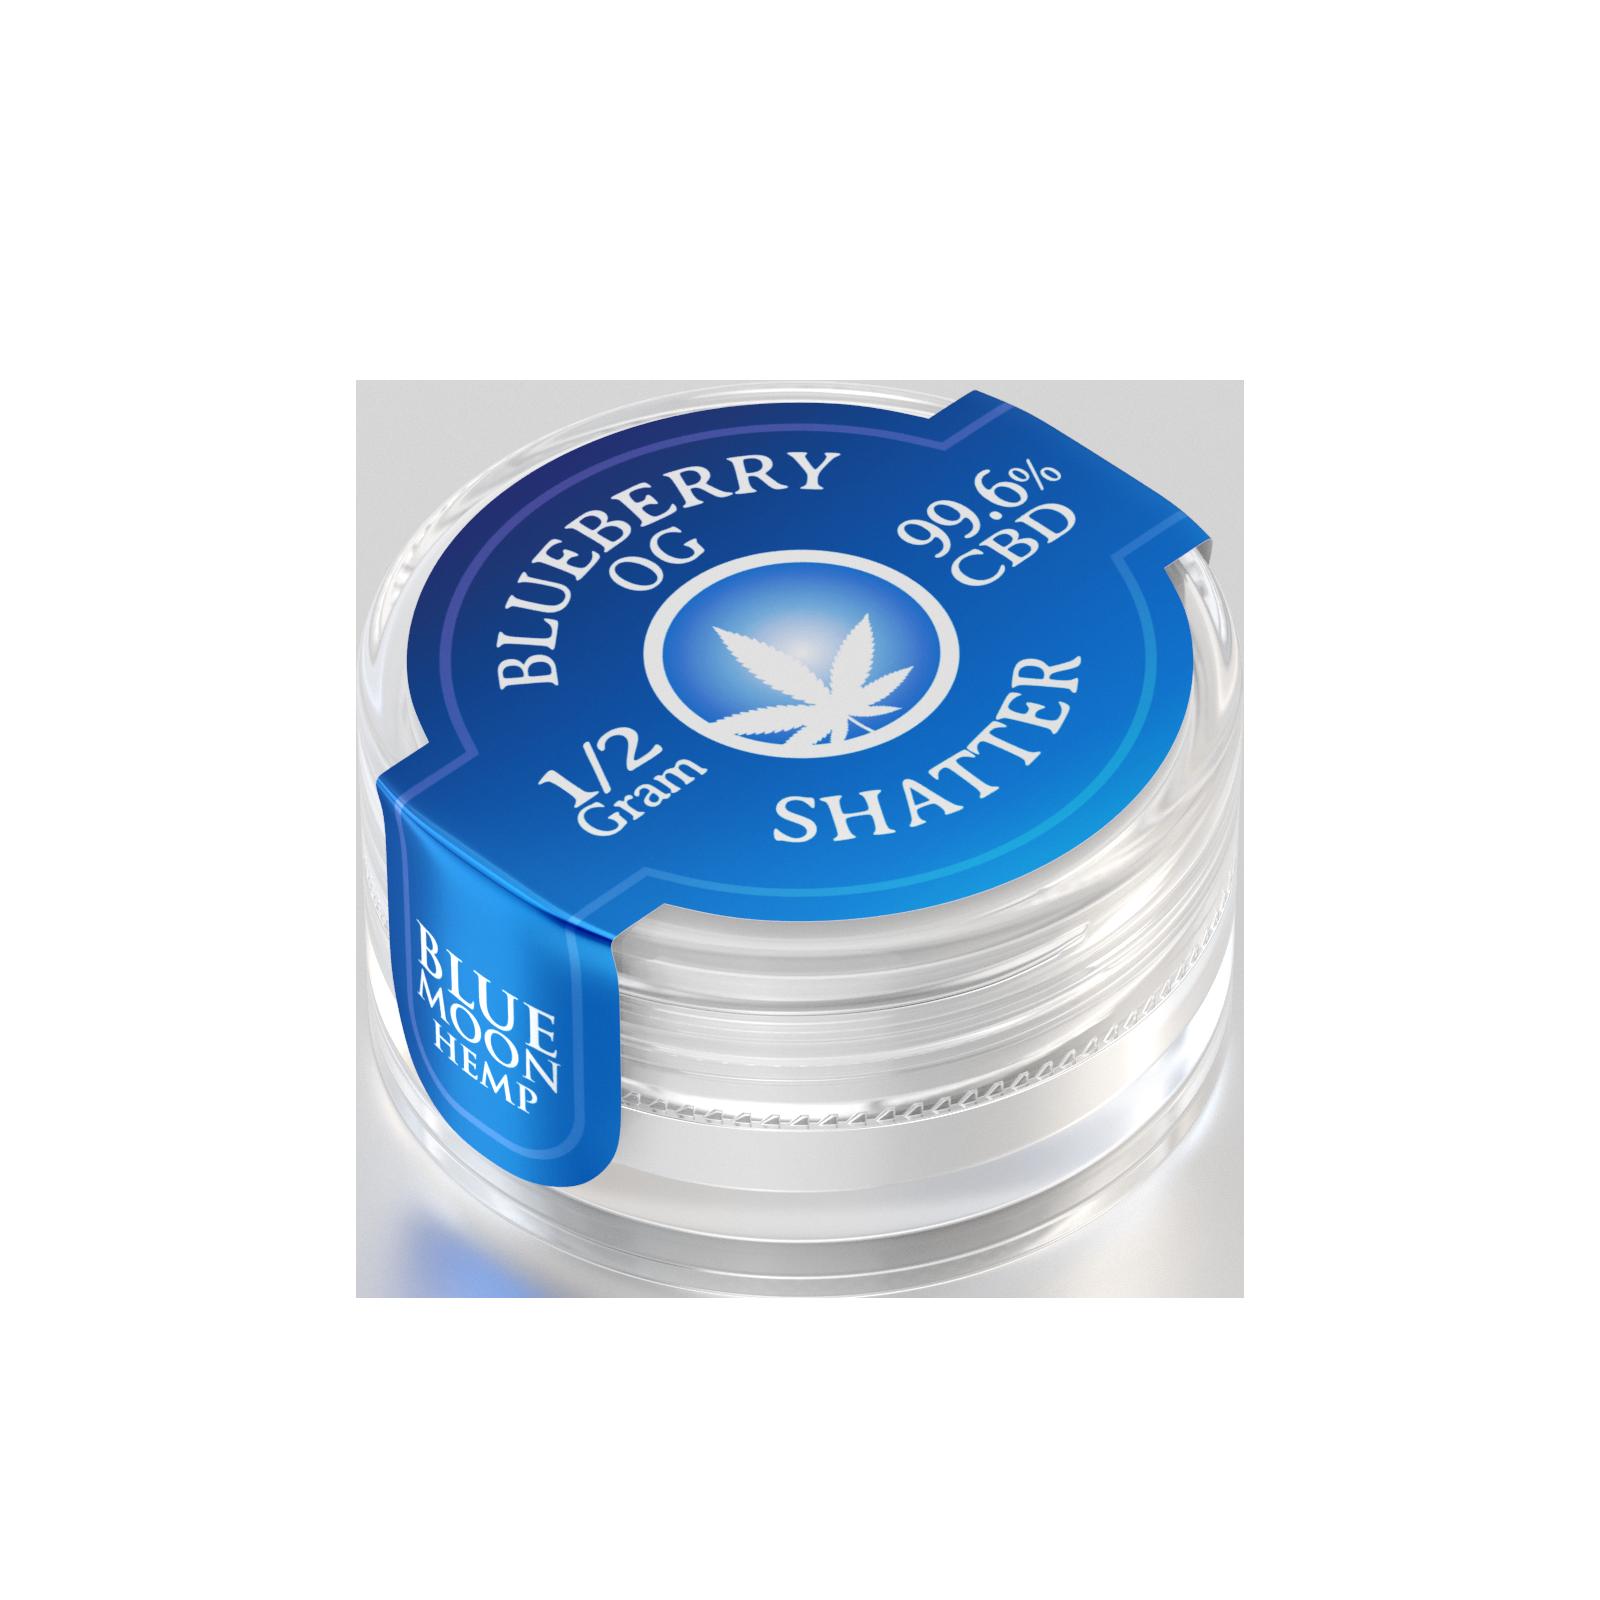 Shatter_0,5gr_Blueberry_Top